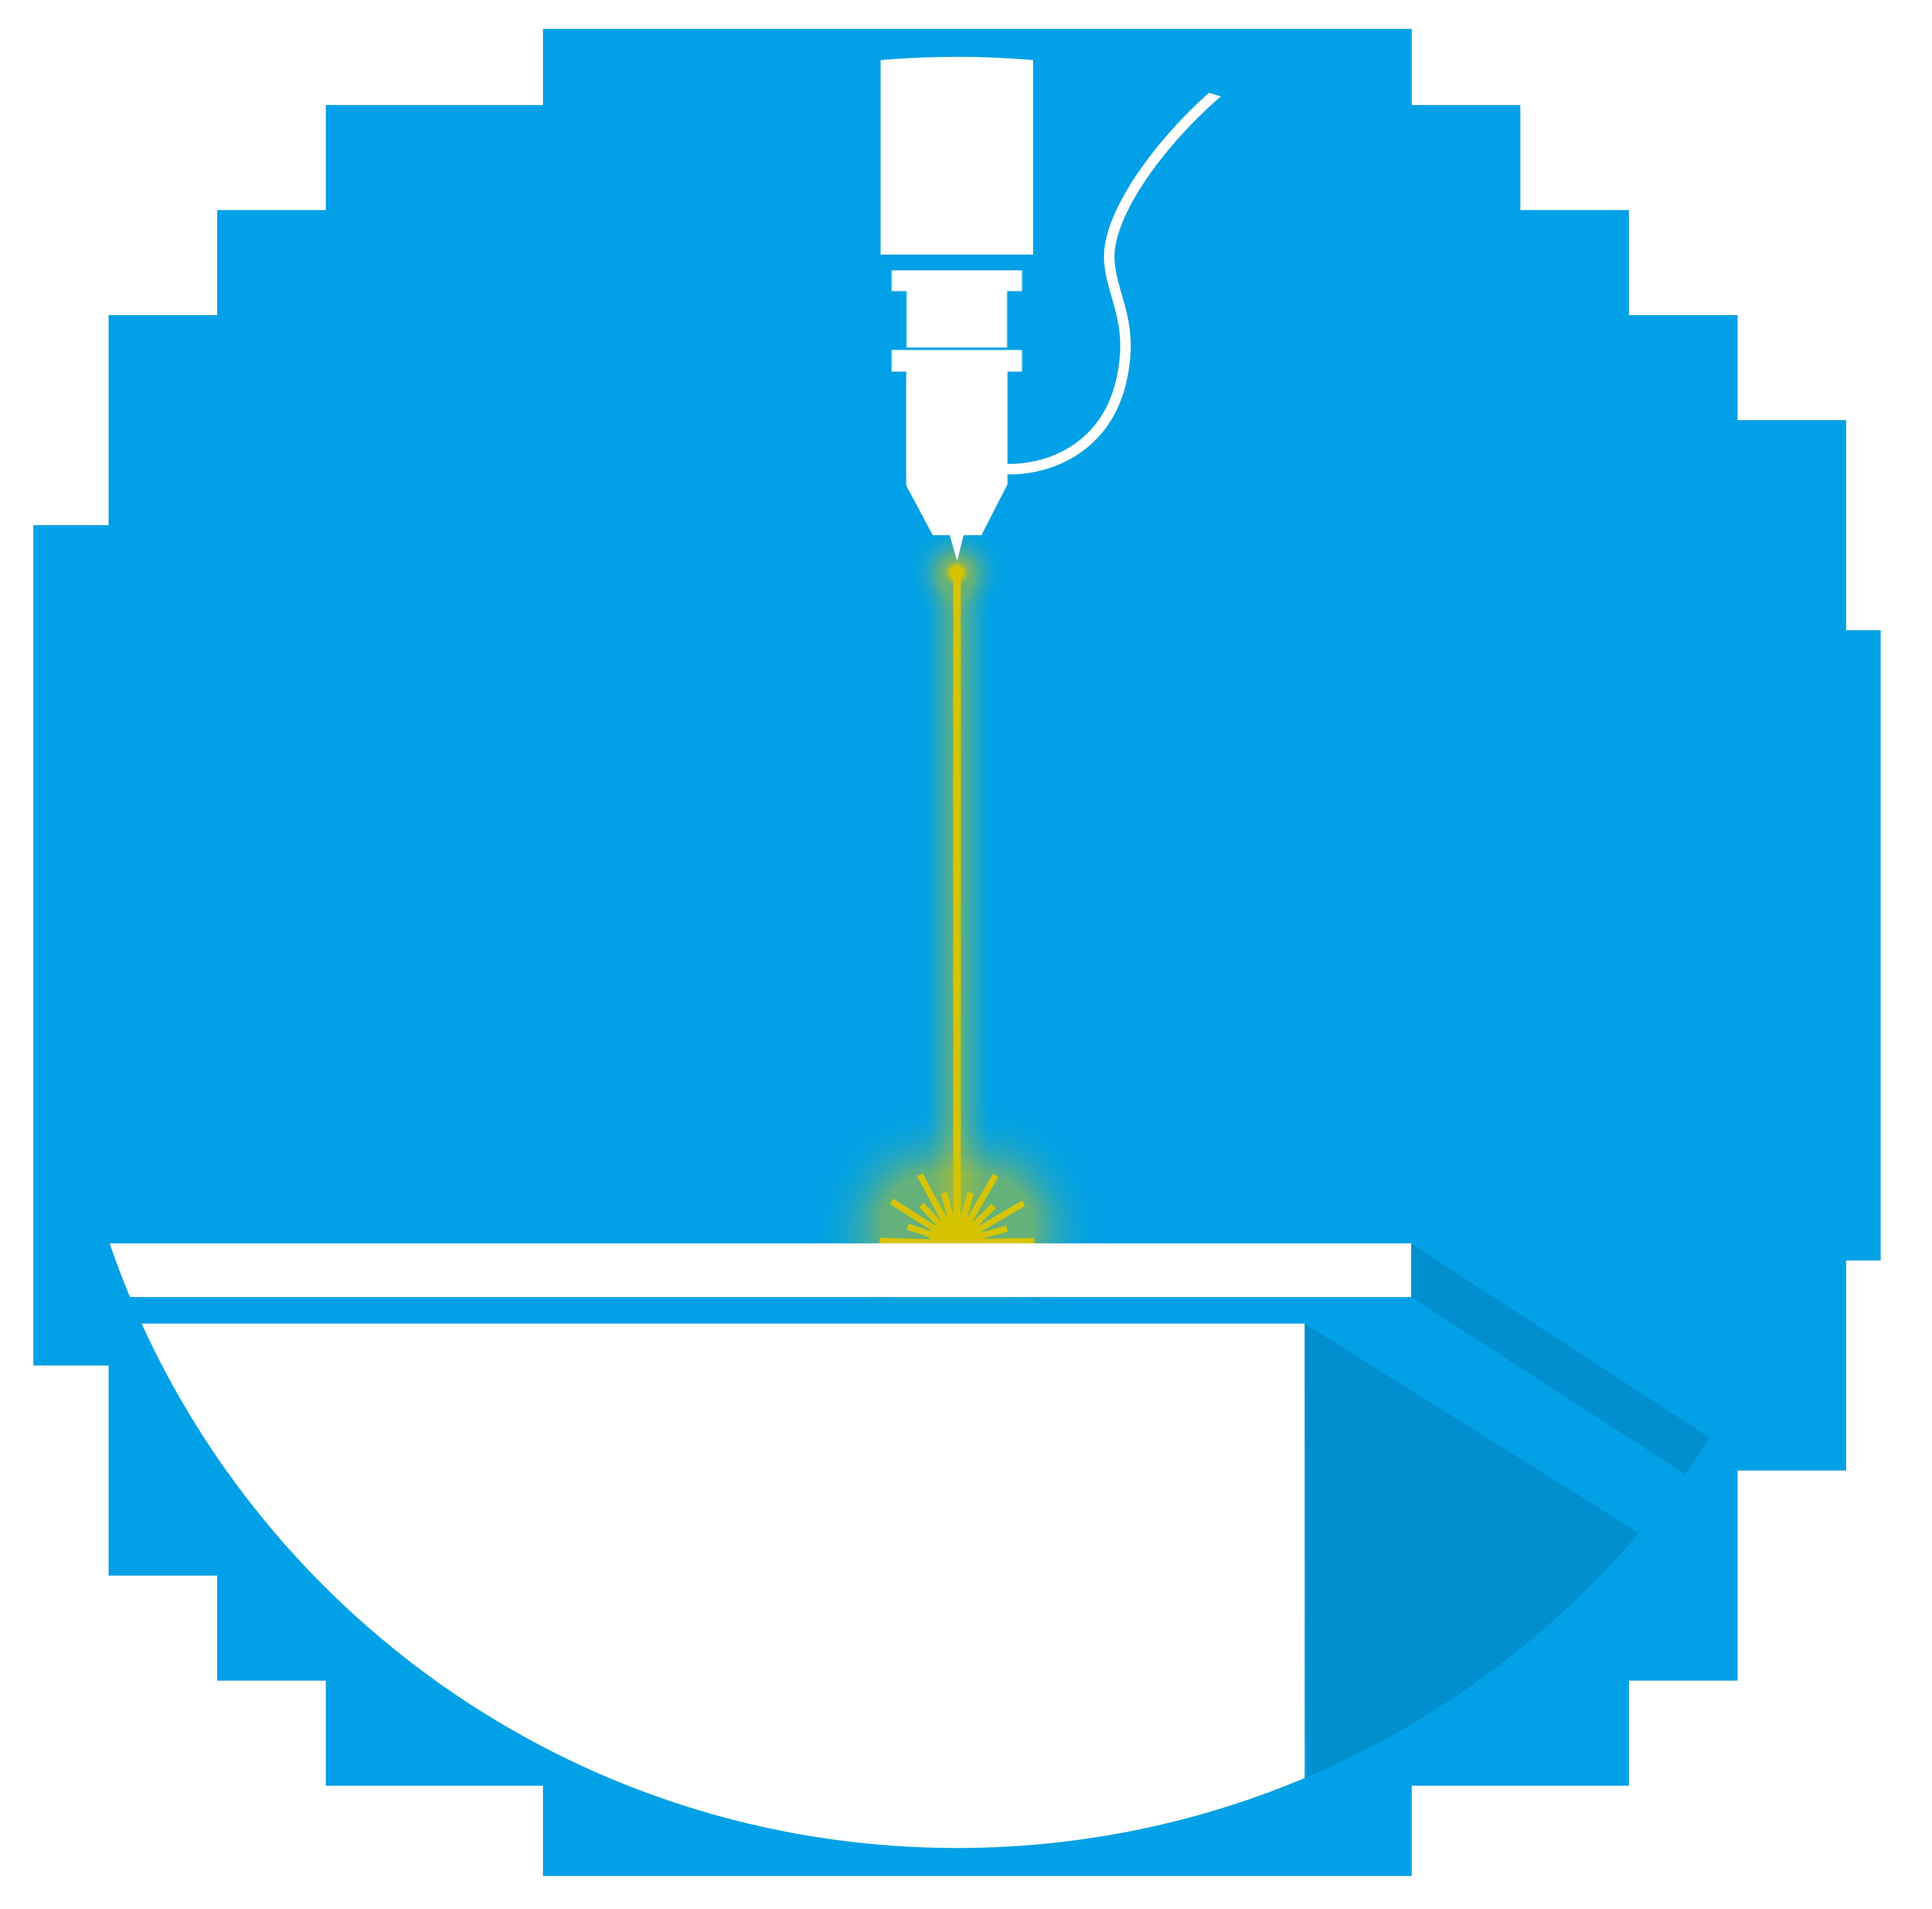 іконка для сайту лазерна порізка